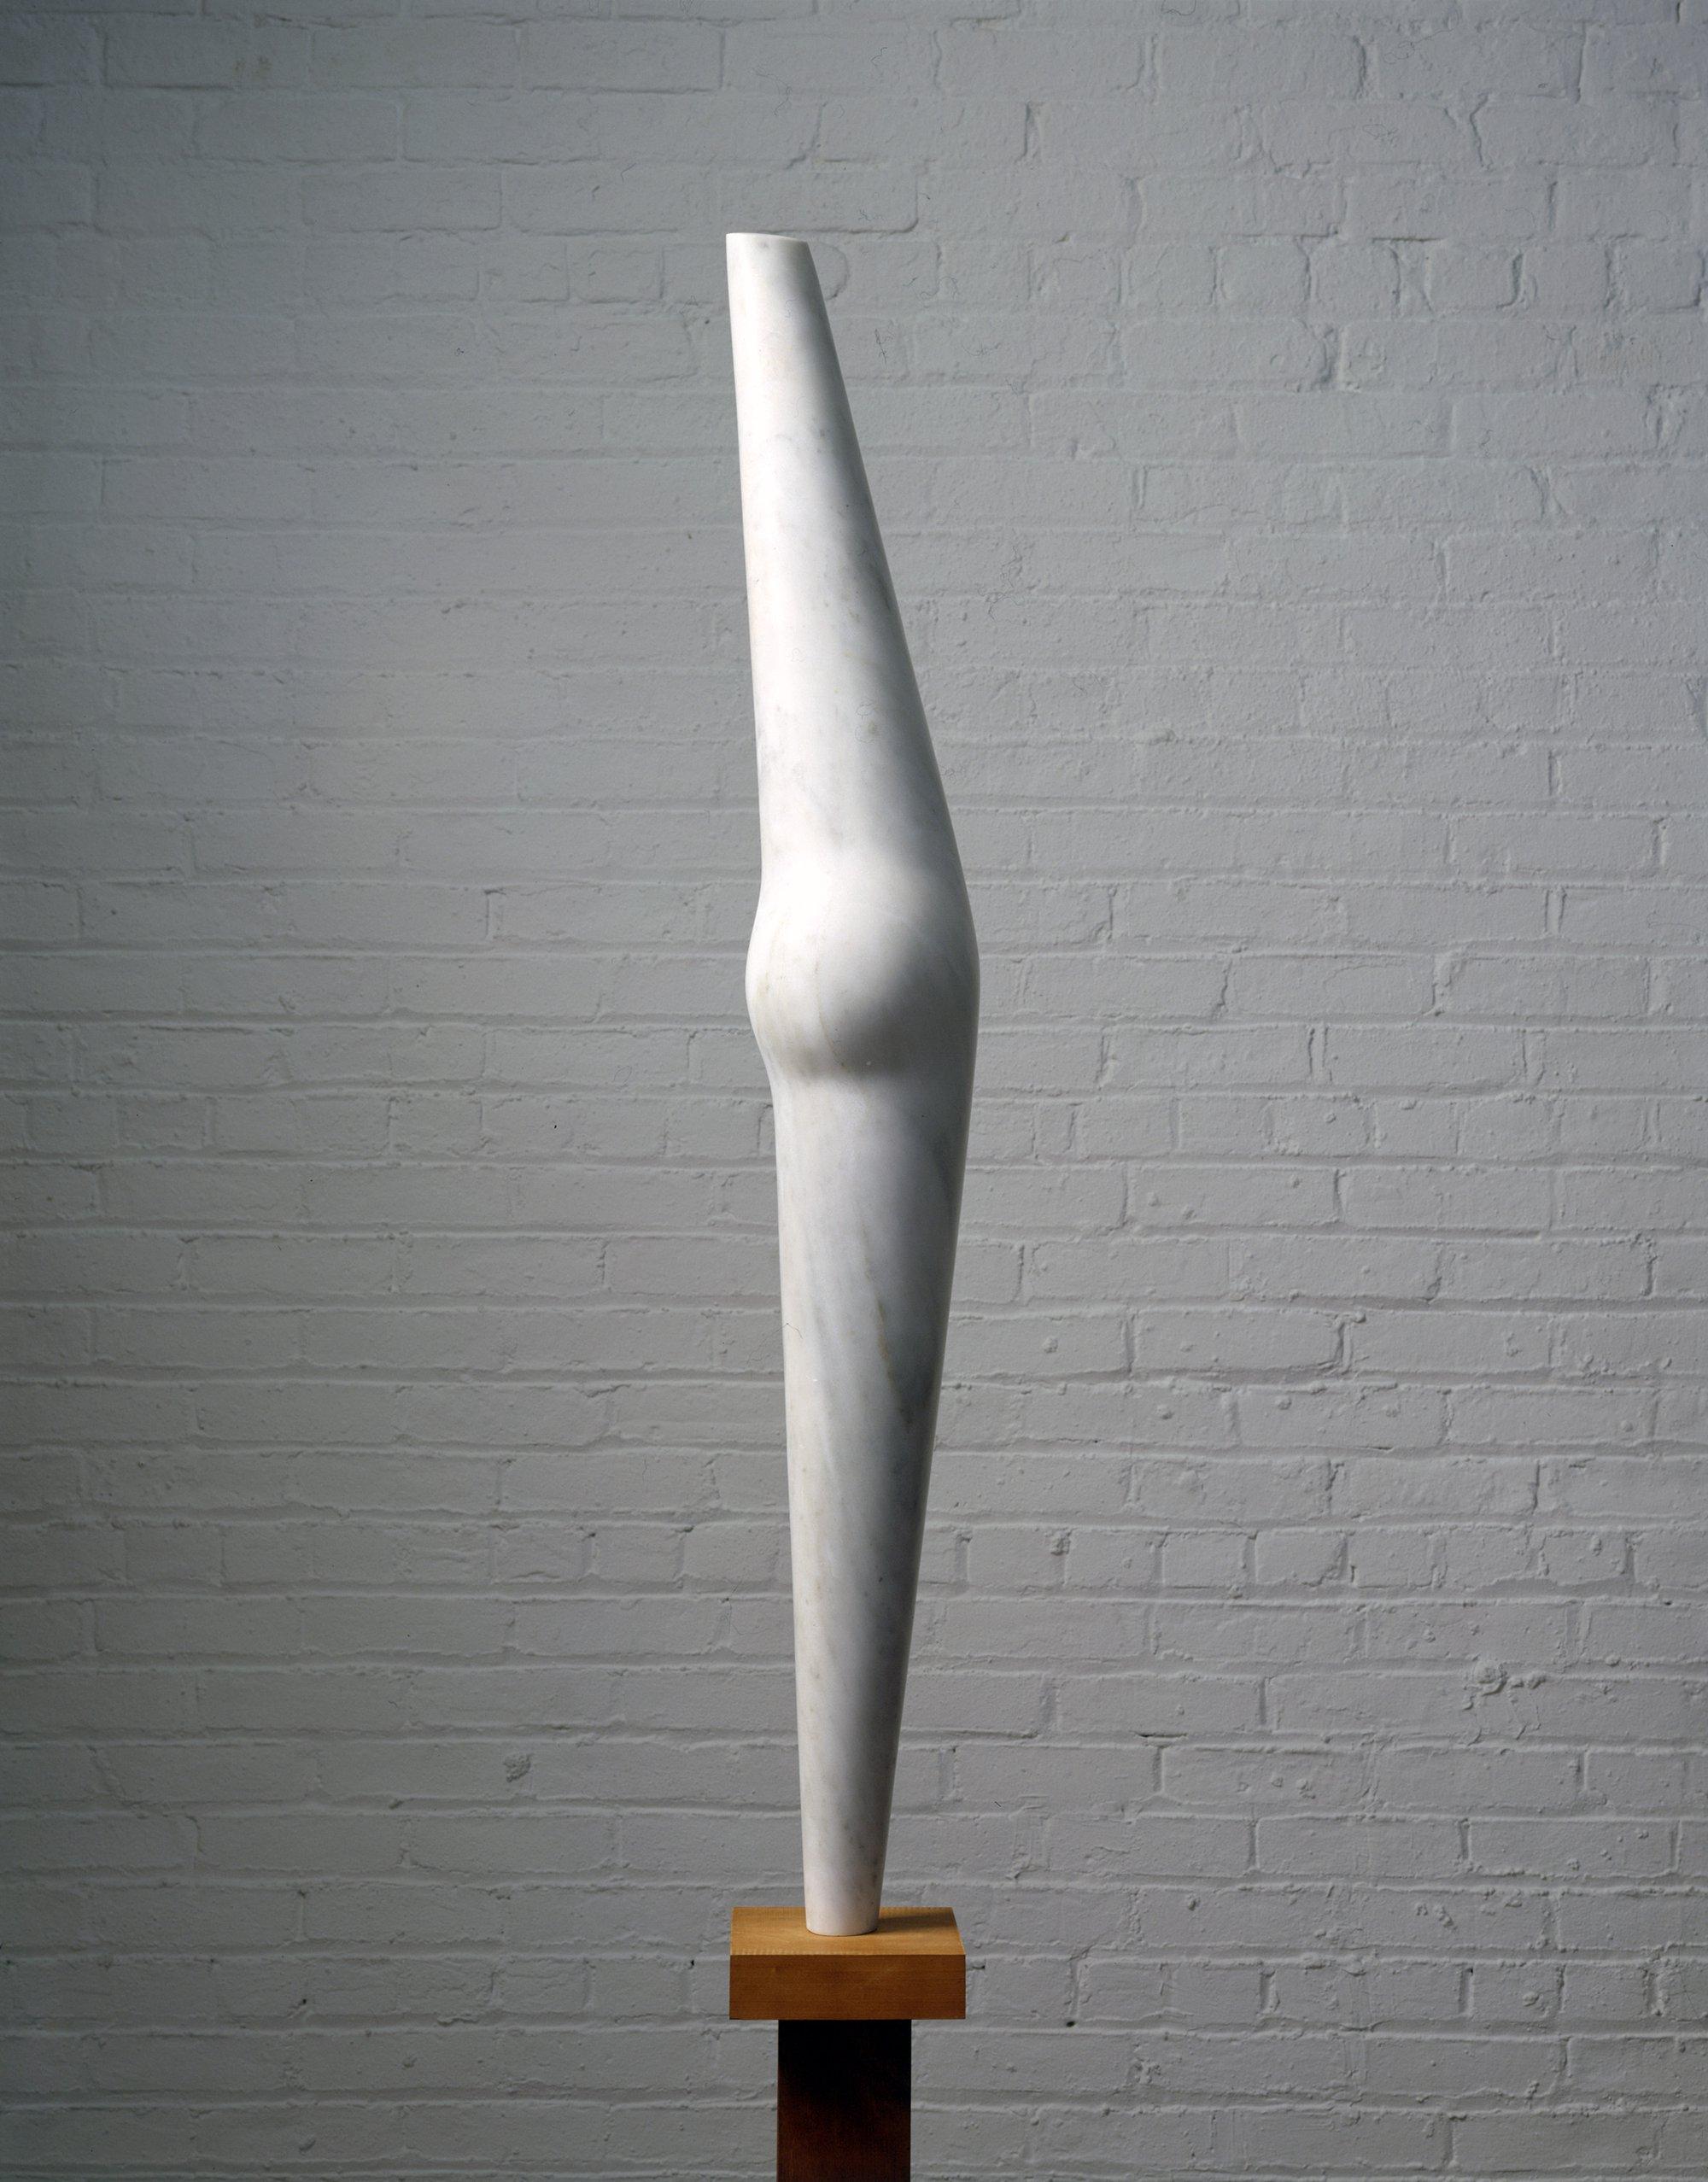 Sofia Italian Design Avis isamu noguchi | pace gallery